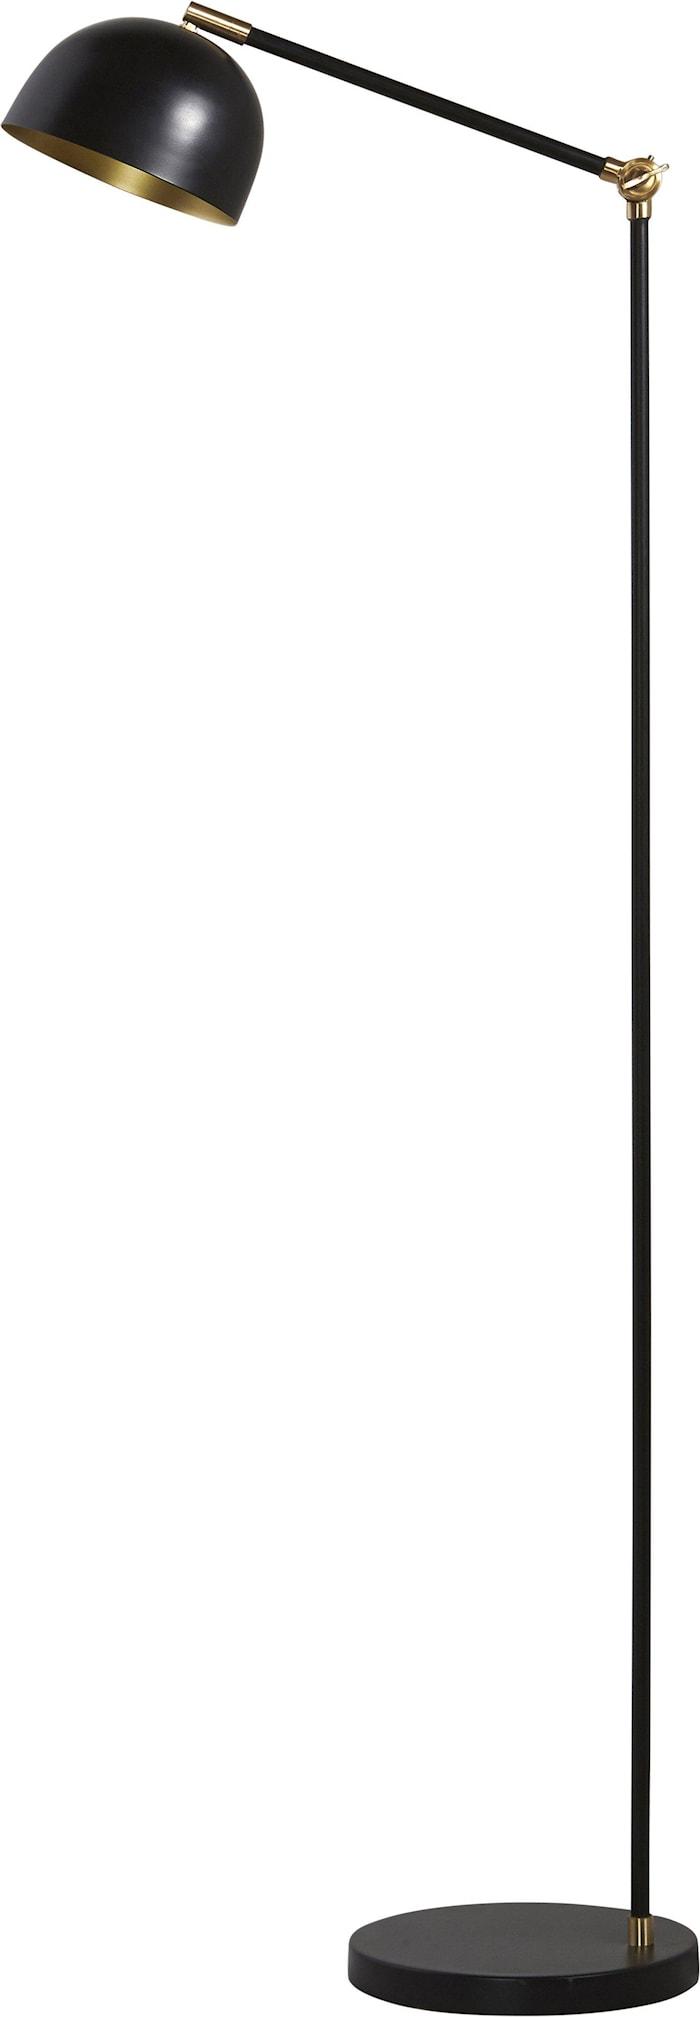 Brighton Golvfot Svart 123-154cm